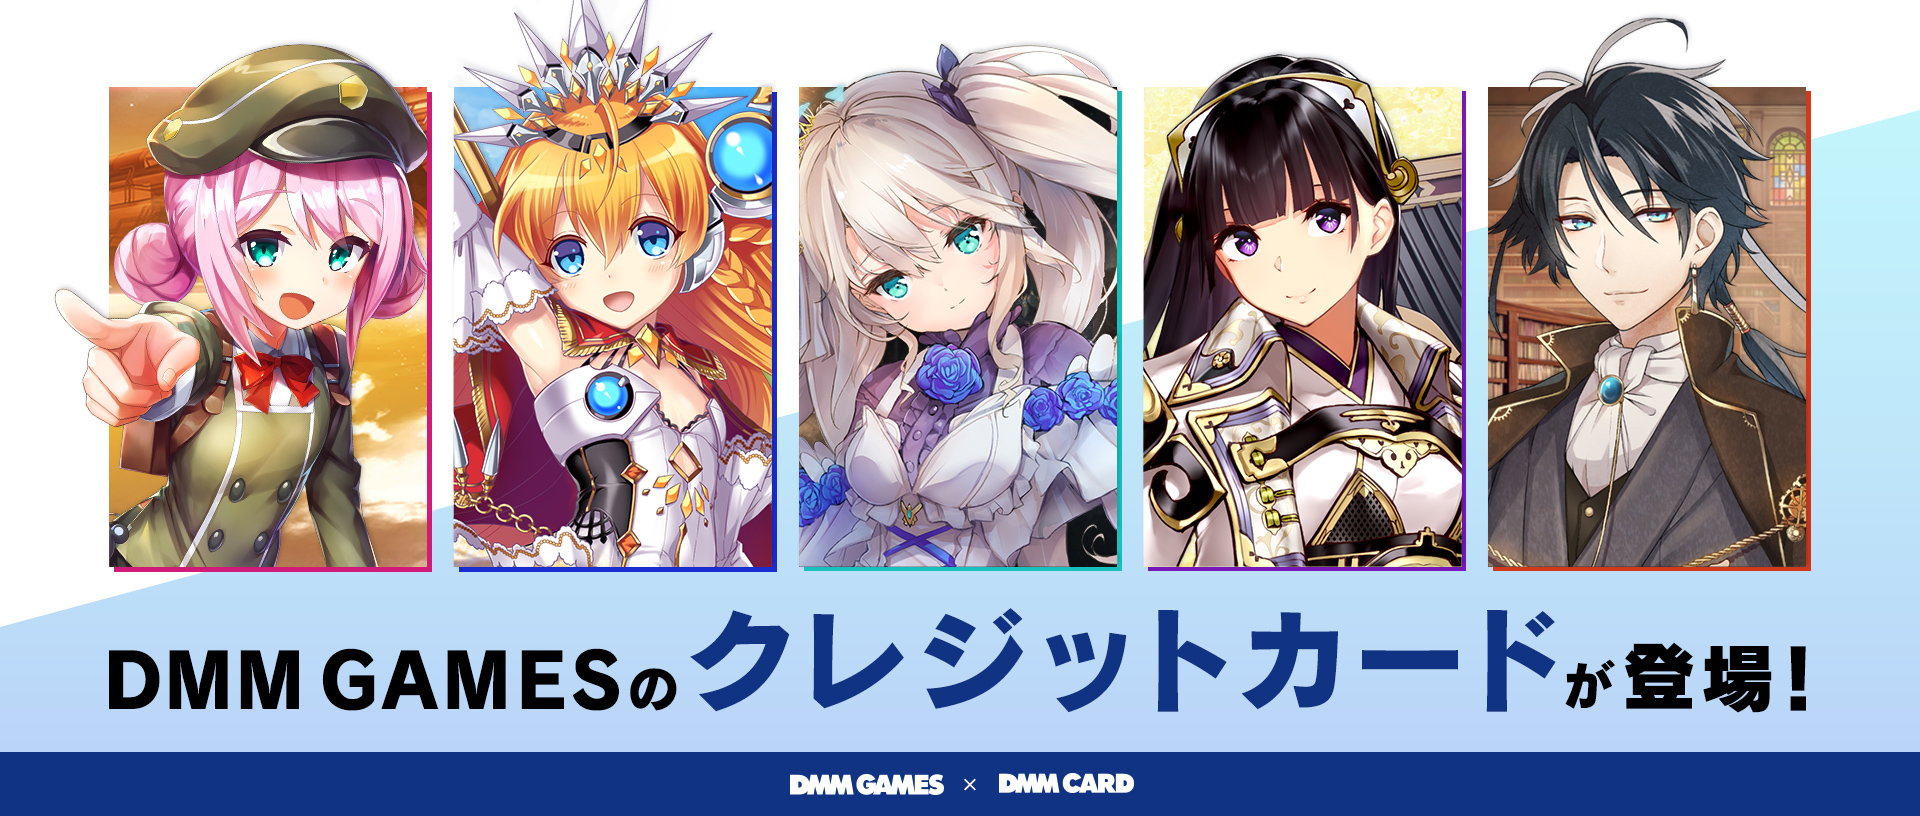 DMM GAMESのクレジットカードが登場! DMM GAMES × DMM CARD